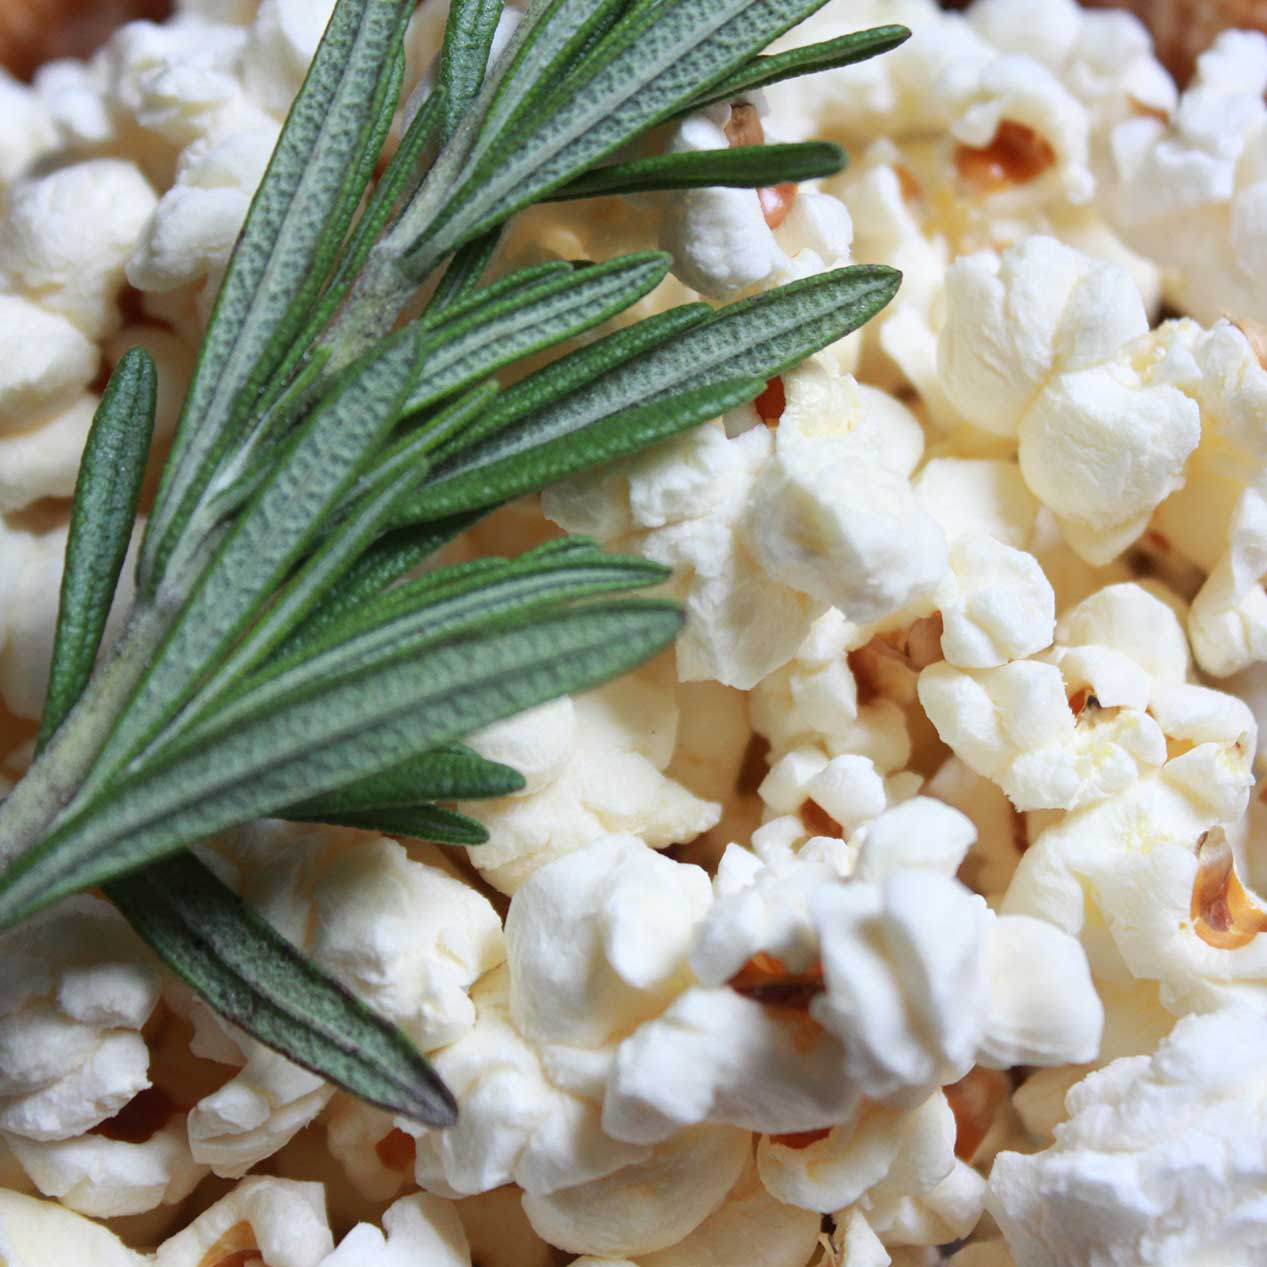 ella-and-ollie-heirloom-popcorn-st-louis-missouri-belleville-illinois-popcorn-wodden-bowl-square.jpg